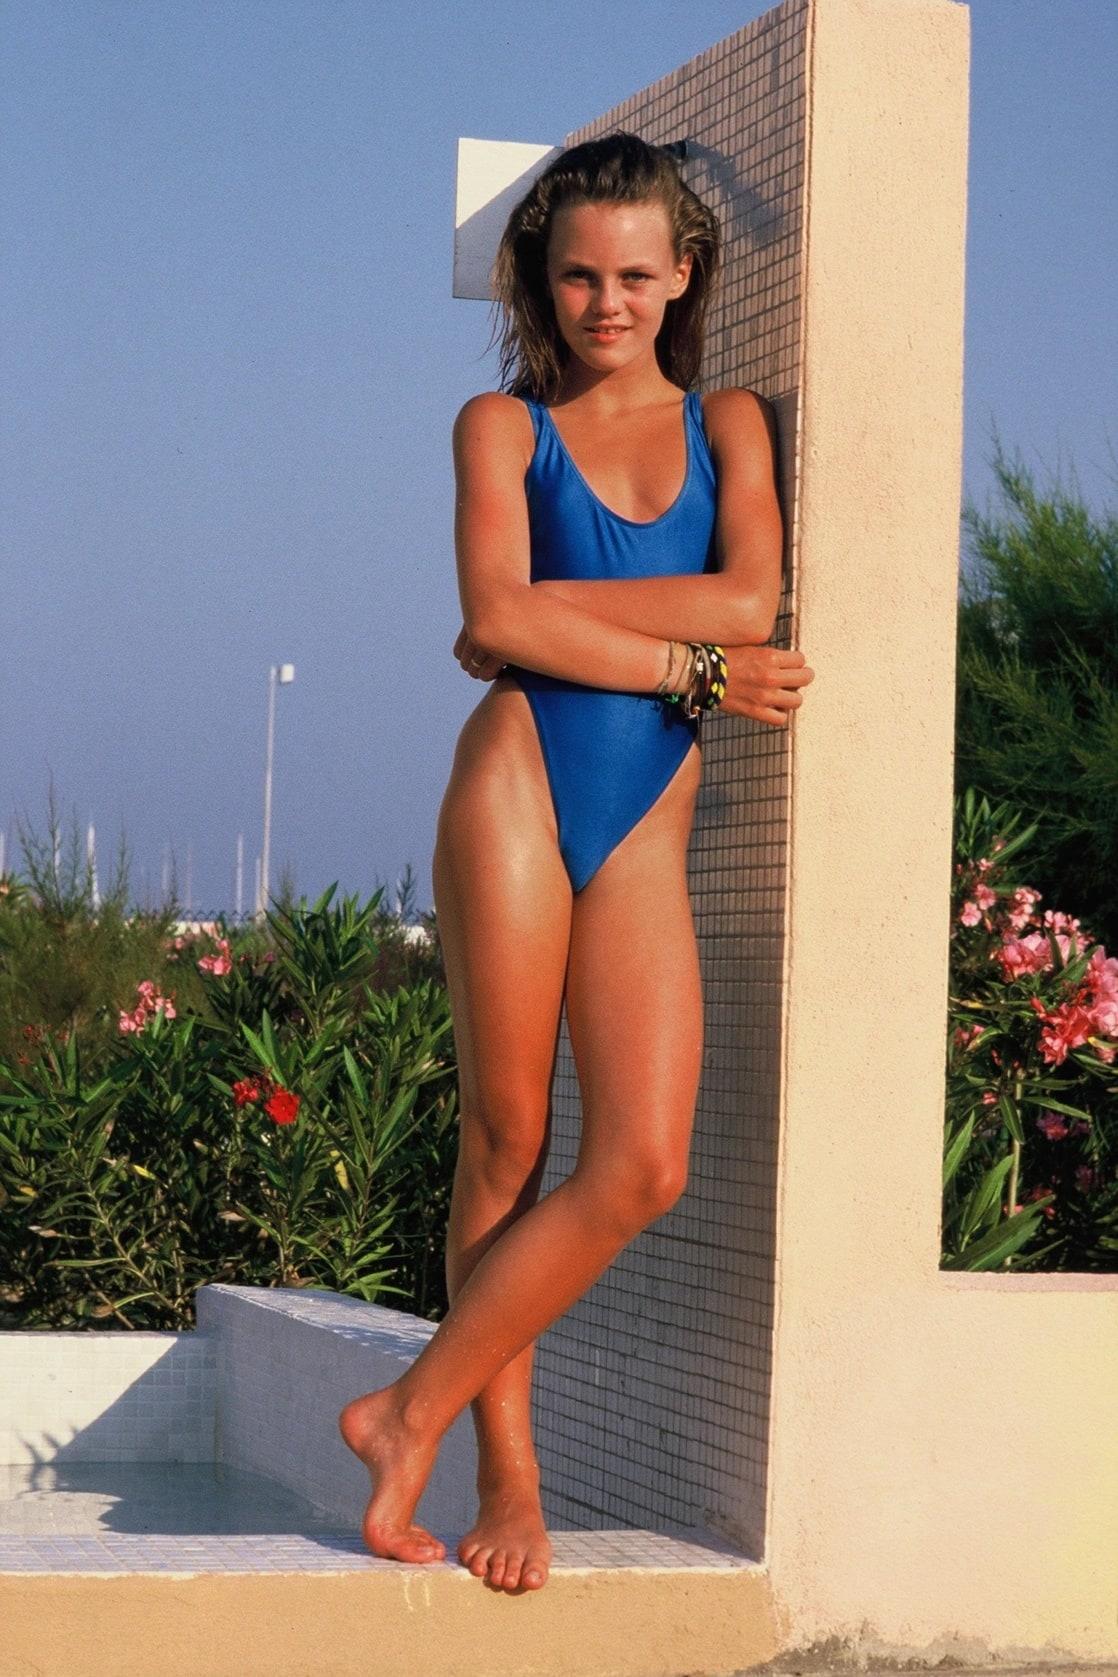 Bikini Vanessa Paradis naked (42 foto and video), Tits, Fappening, Twitter, underwear 2006